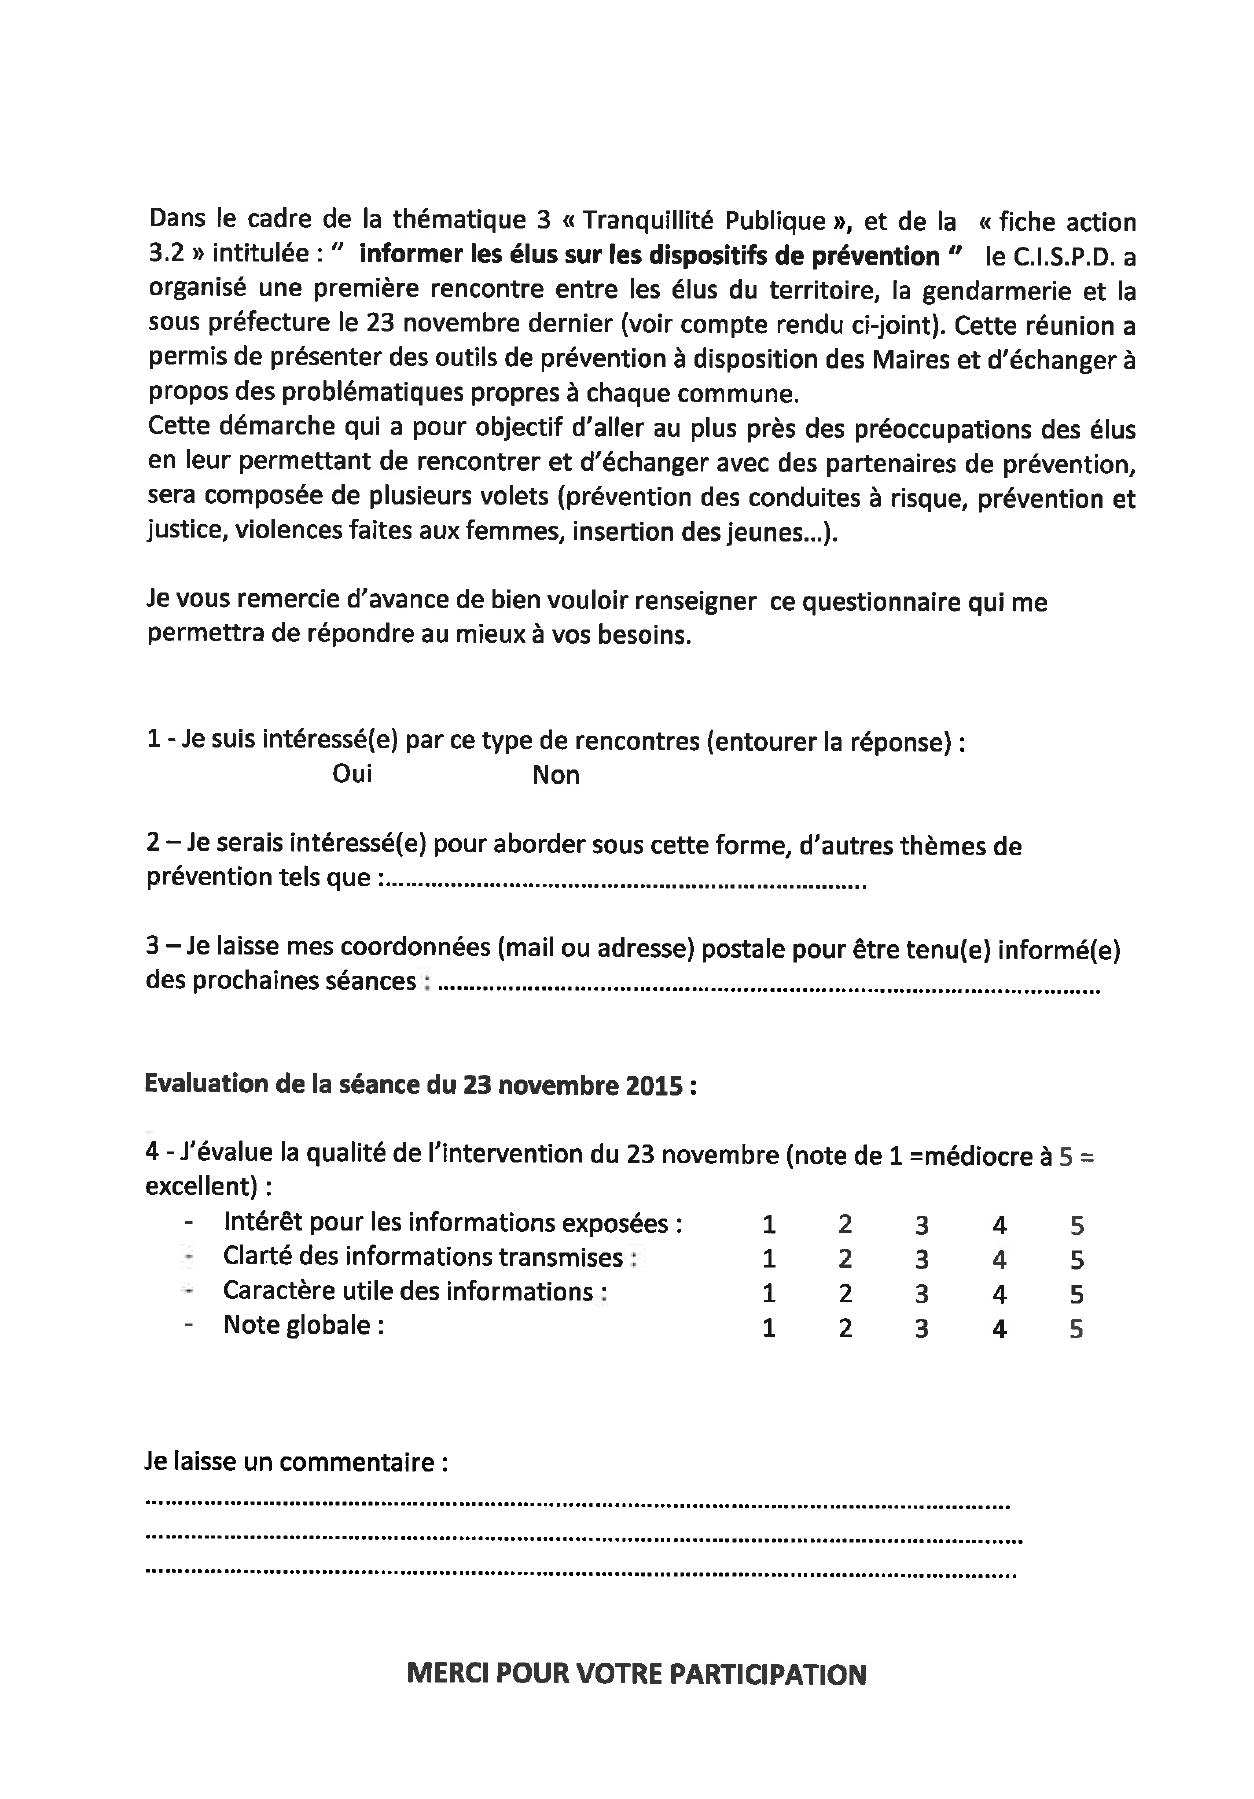 Questionnaire CISPD